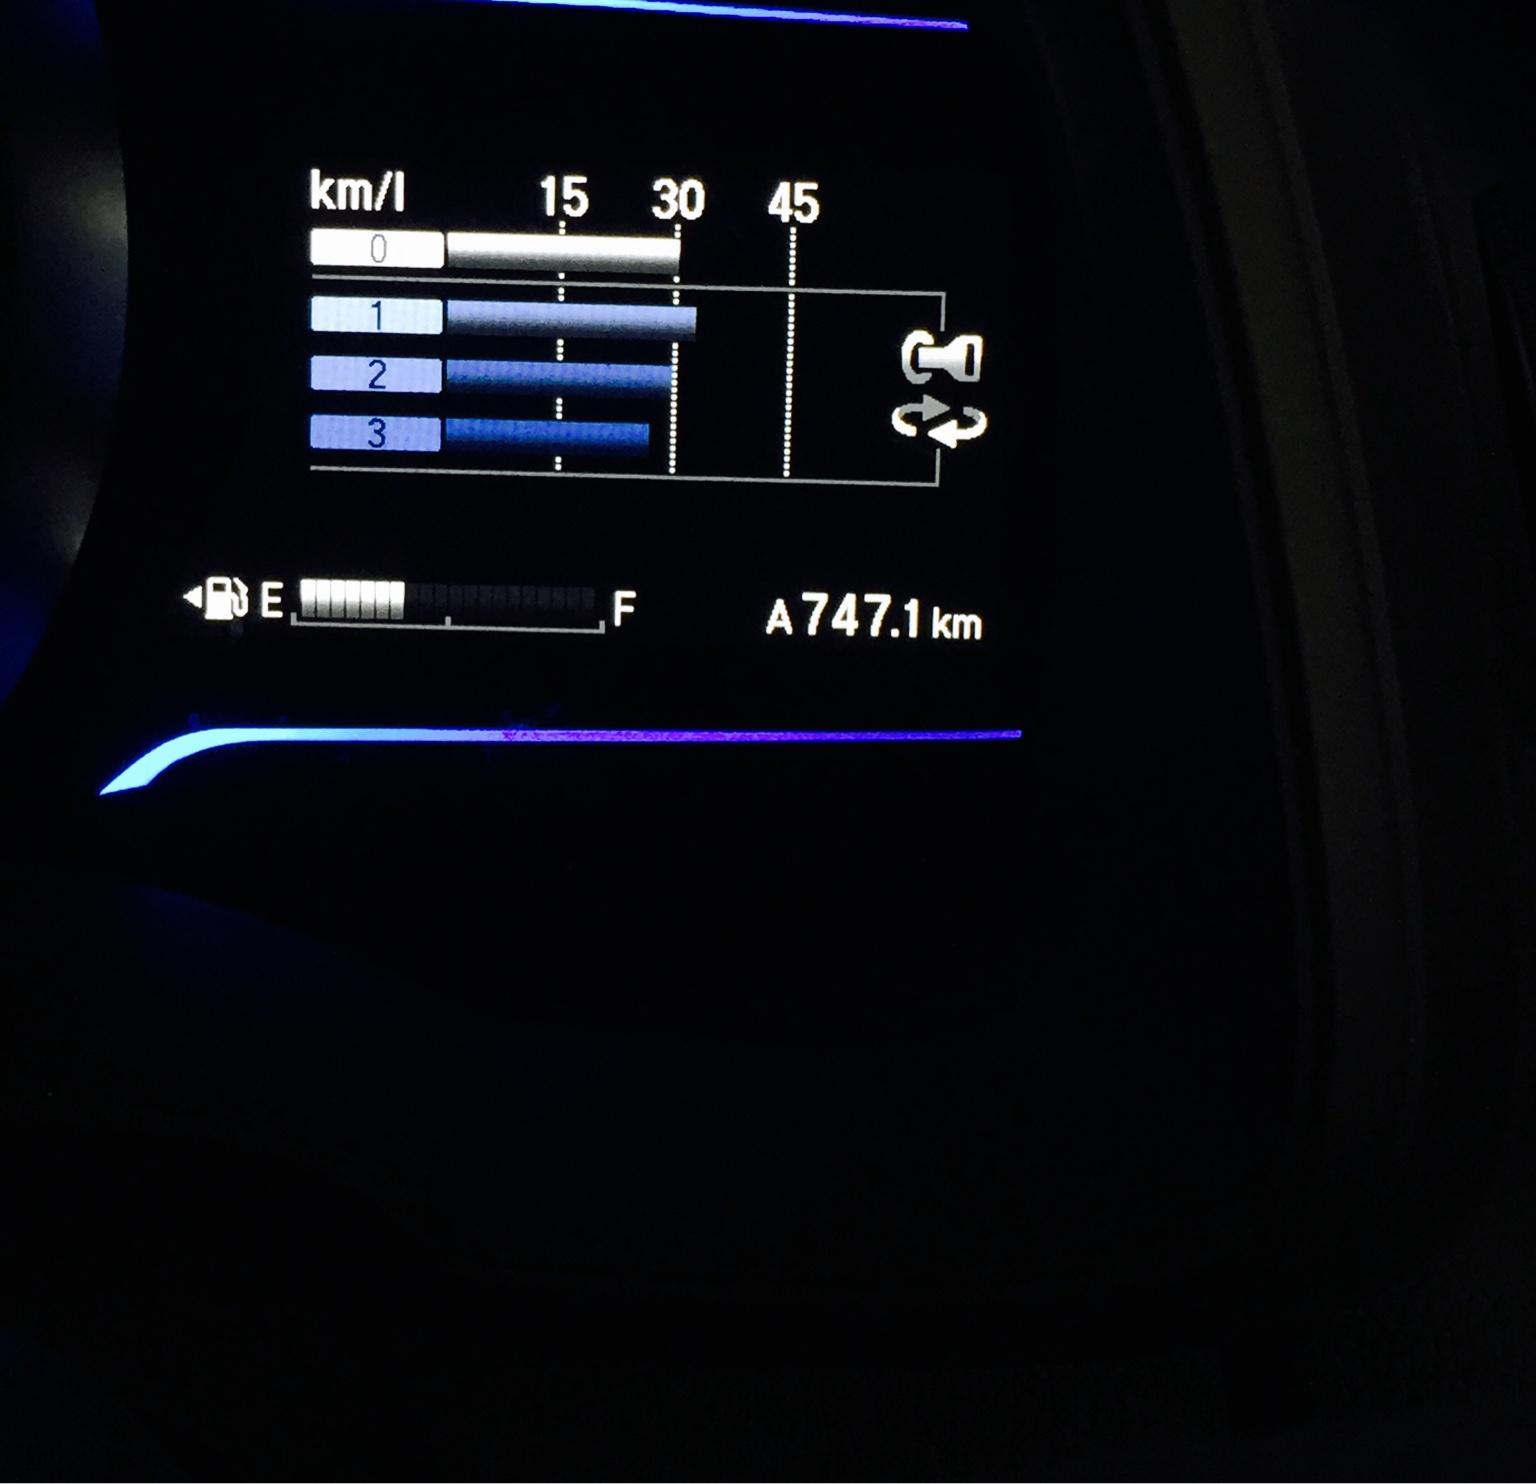 Honda Fit Hybrid Owners and Fans Club - a91bcbff69fa4e56b5bd1066b6e0a54f